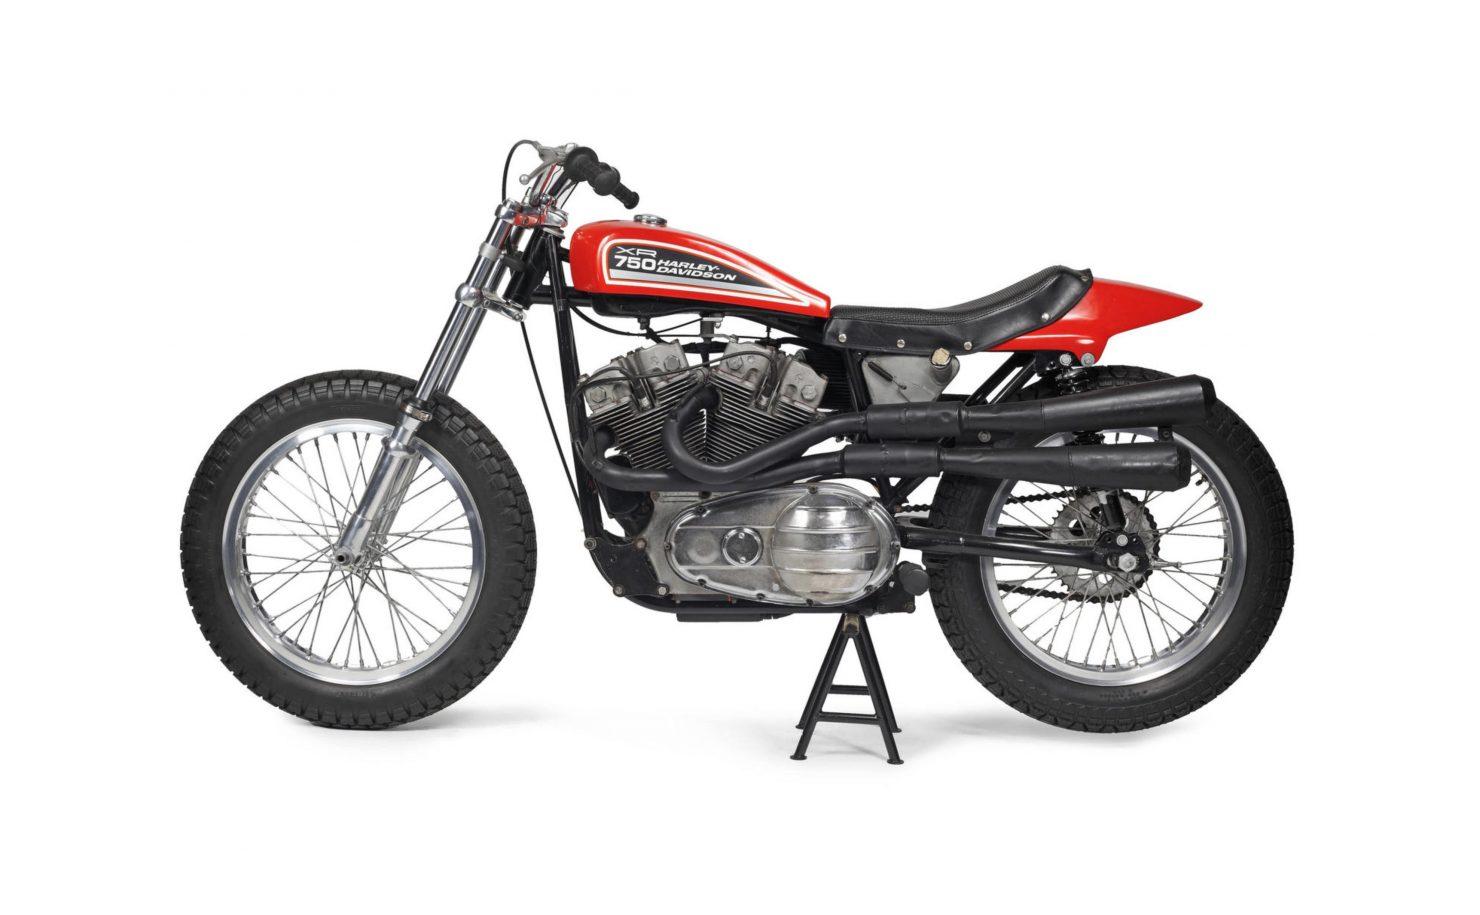 The Harley Davidson Xr 750: The Harley-Davidson XR-750